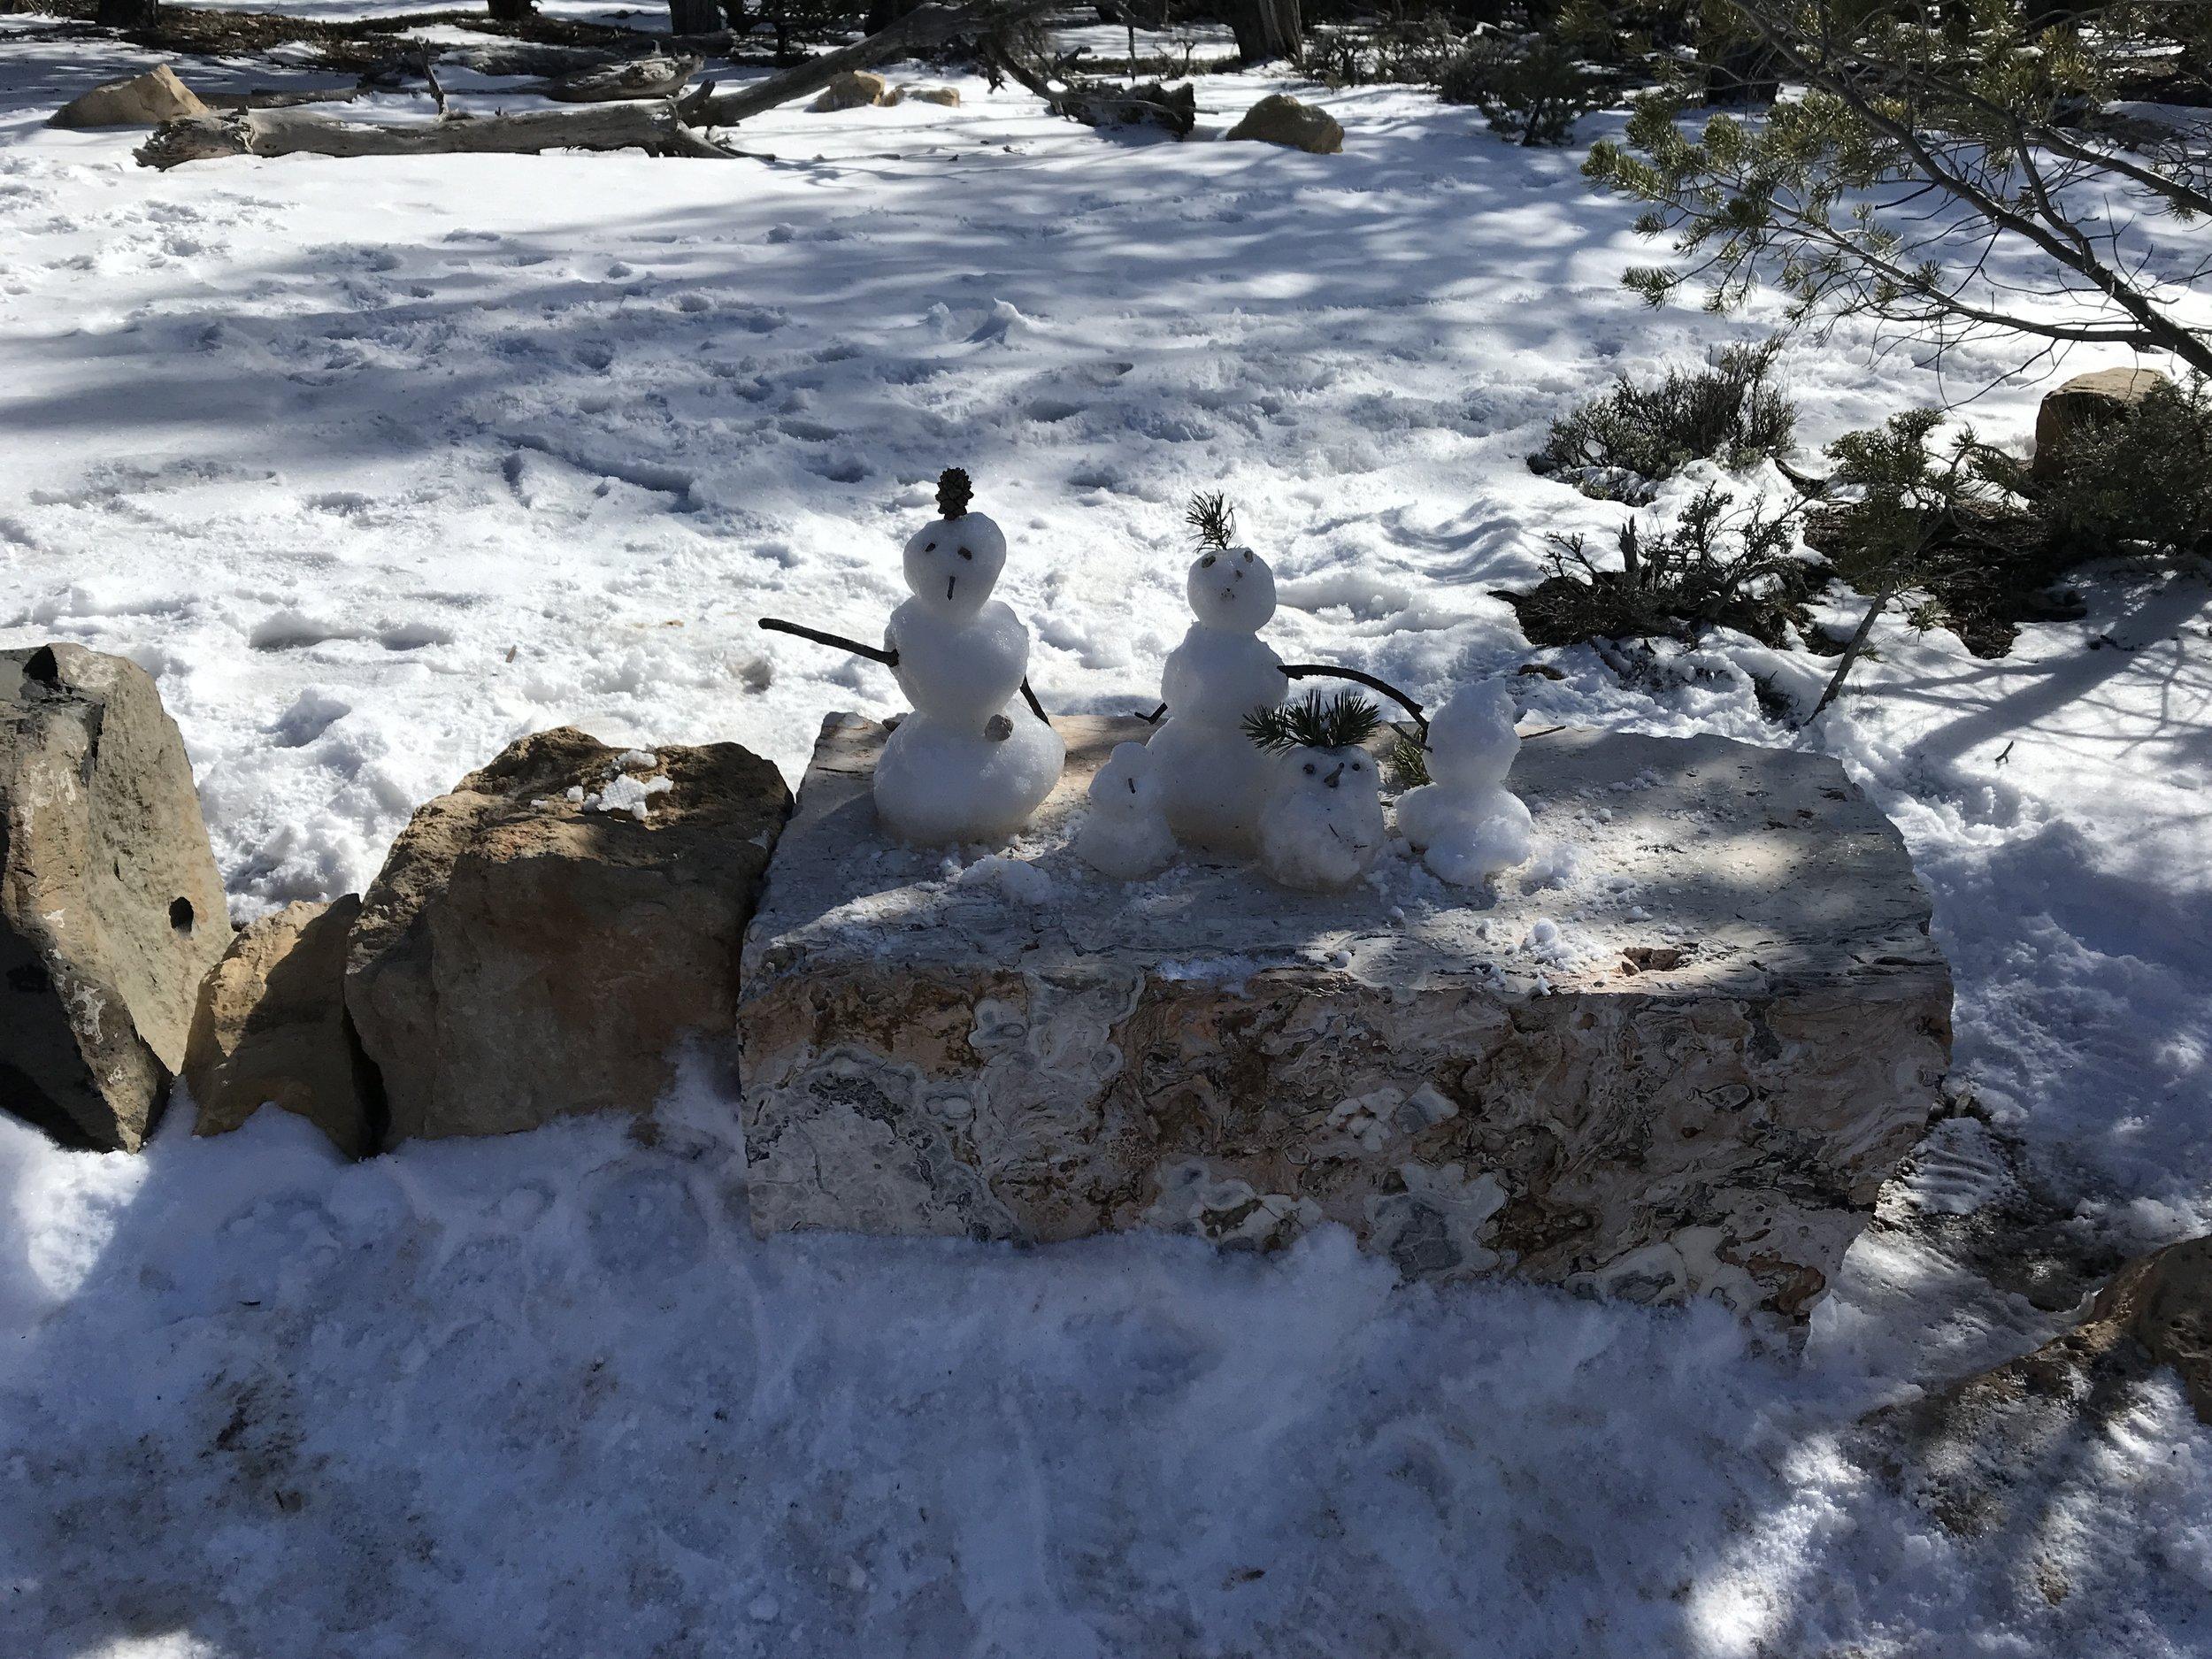 Someone made a snow family